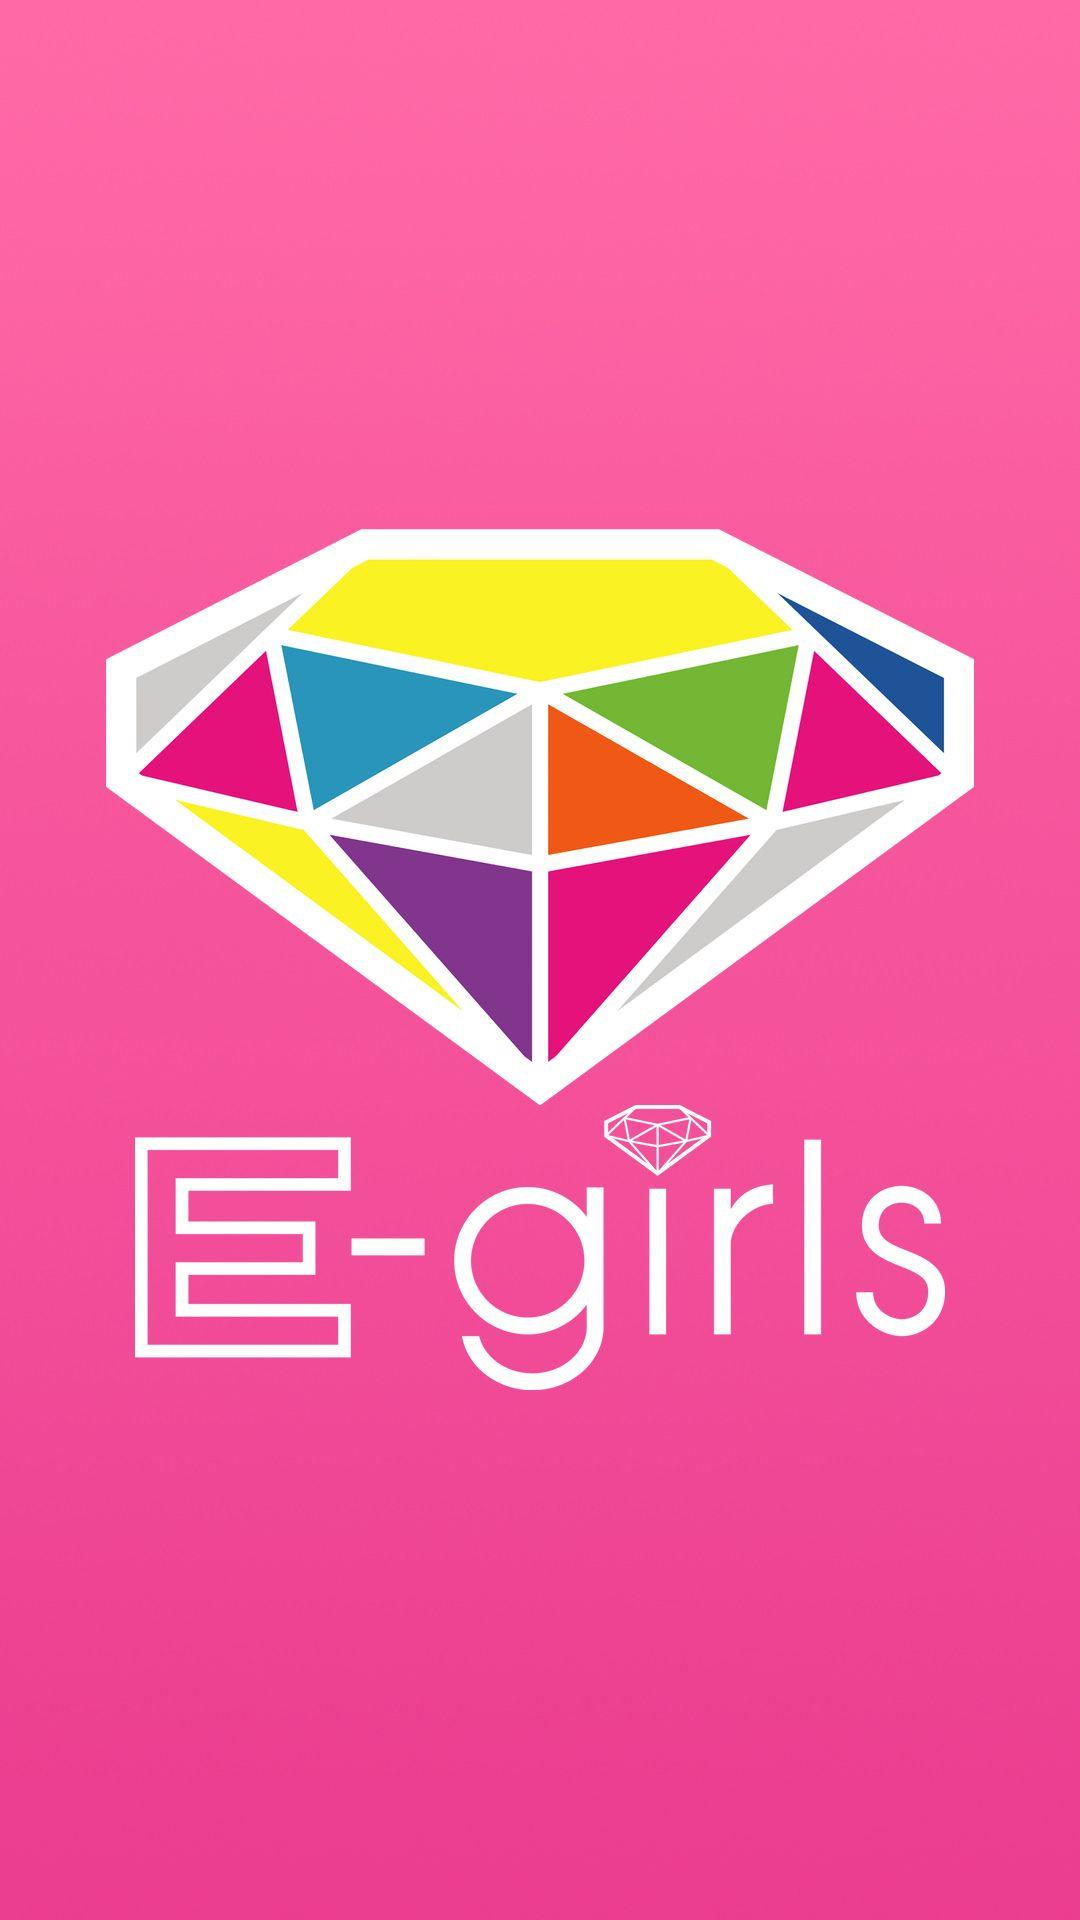 E Girlsのかわいいロゴ Iphone 壁紙 壁紙 Iphone壁紙